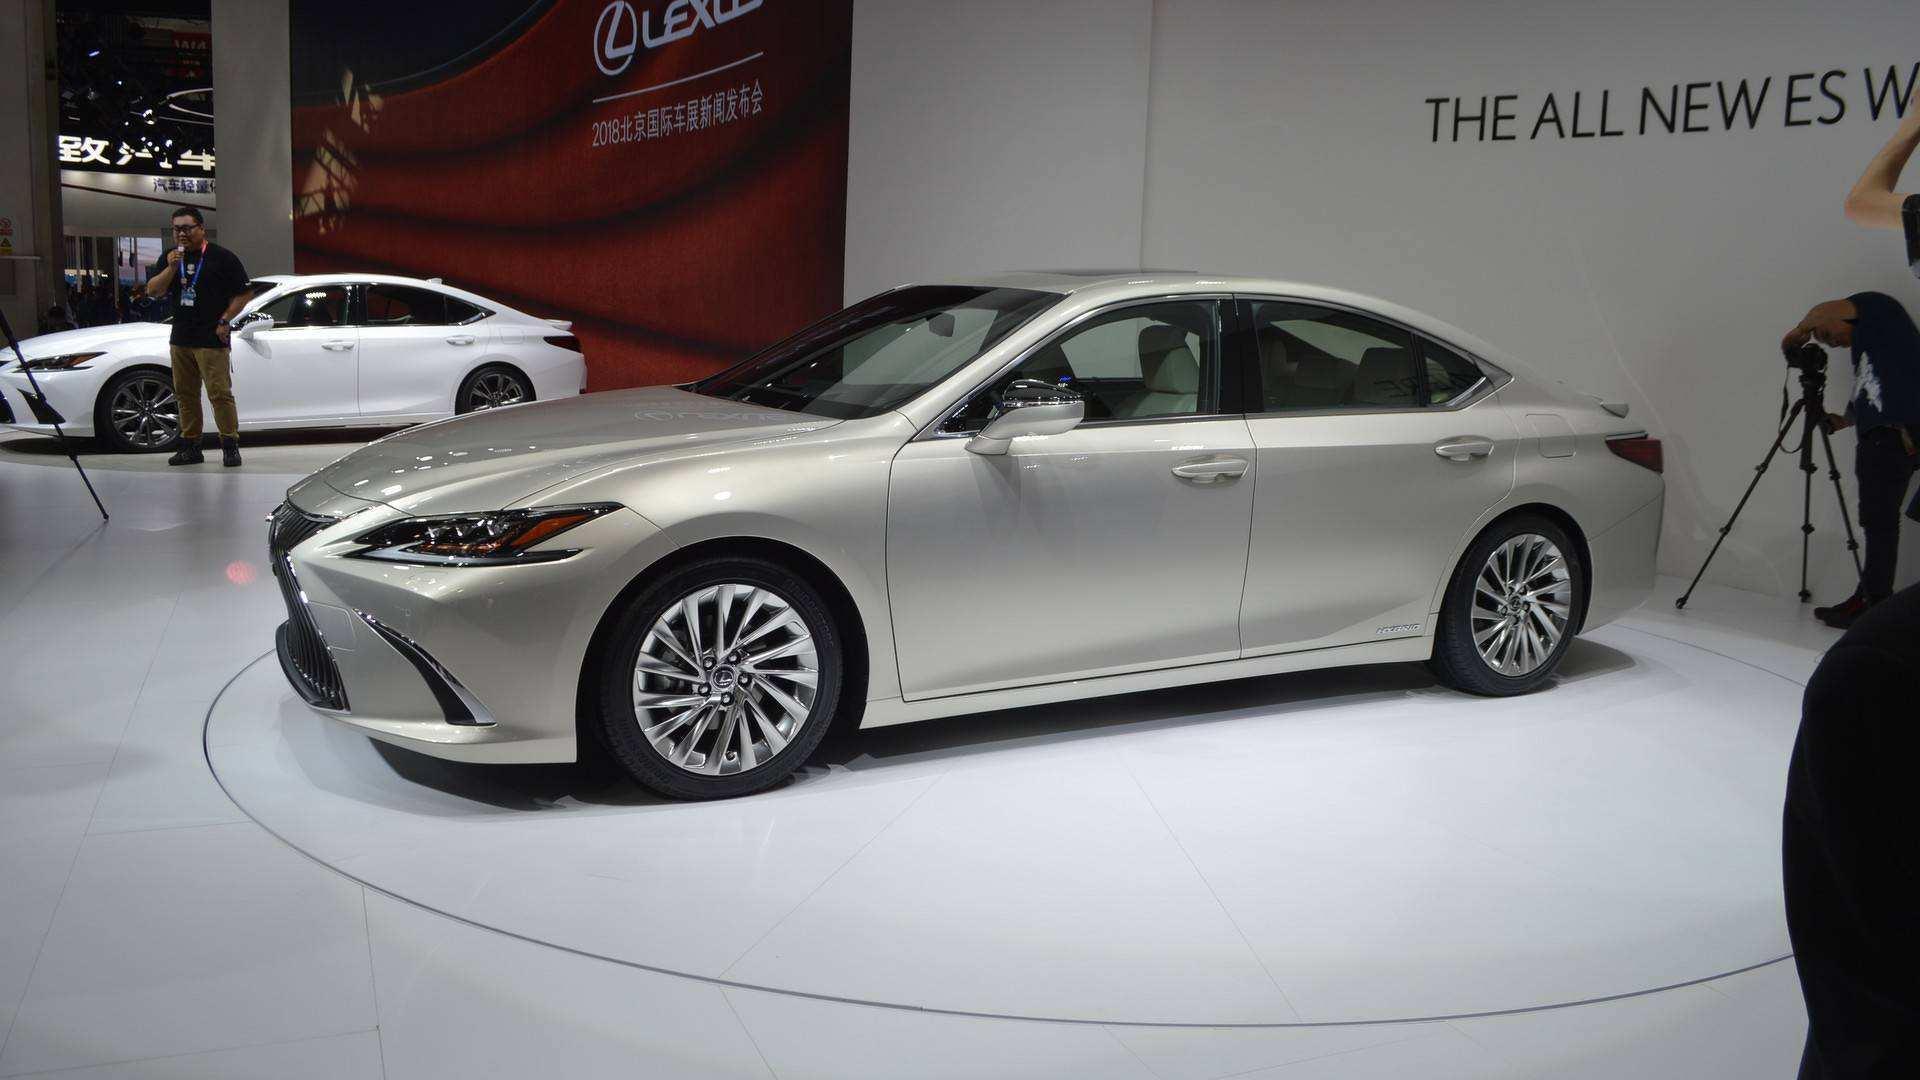 29 Concept of 2019 Lexus 350 Es Release with 2019 Lexus 350 Es